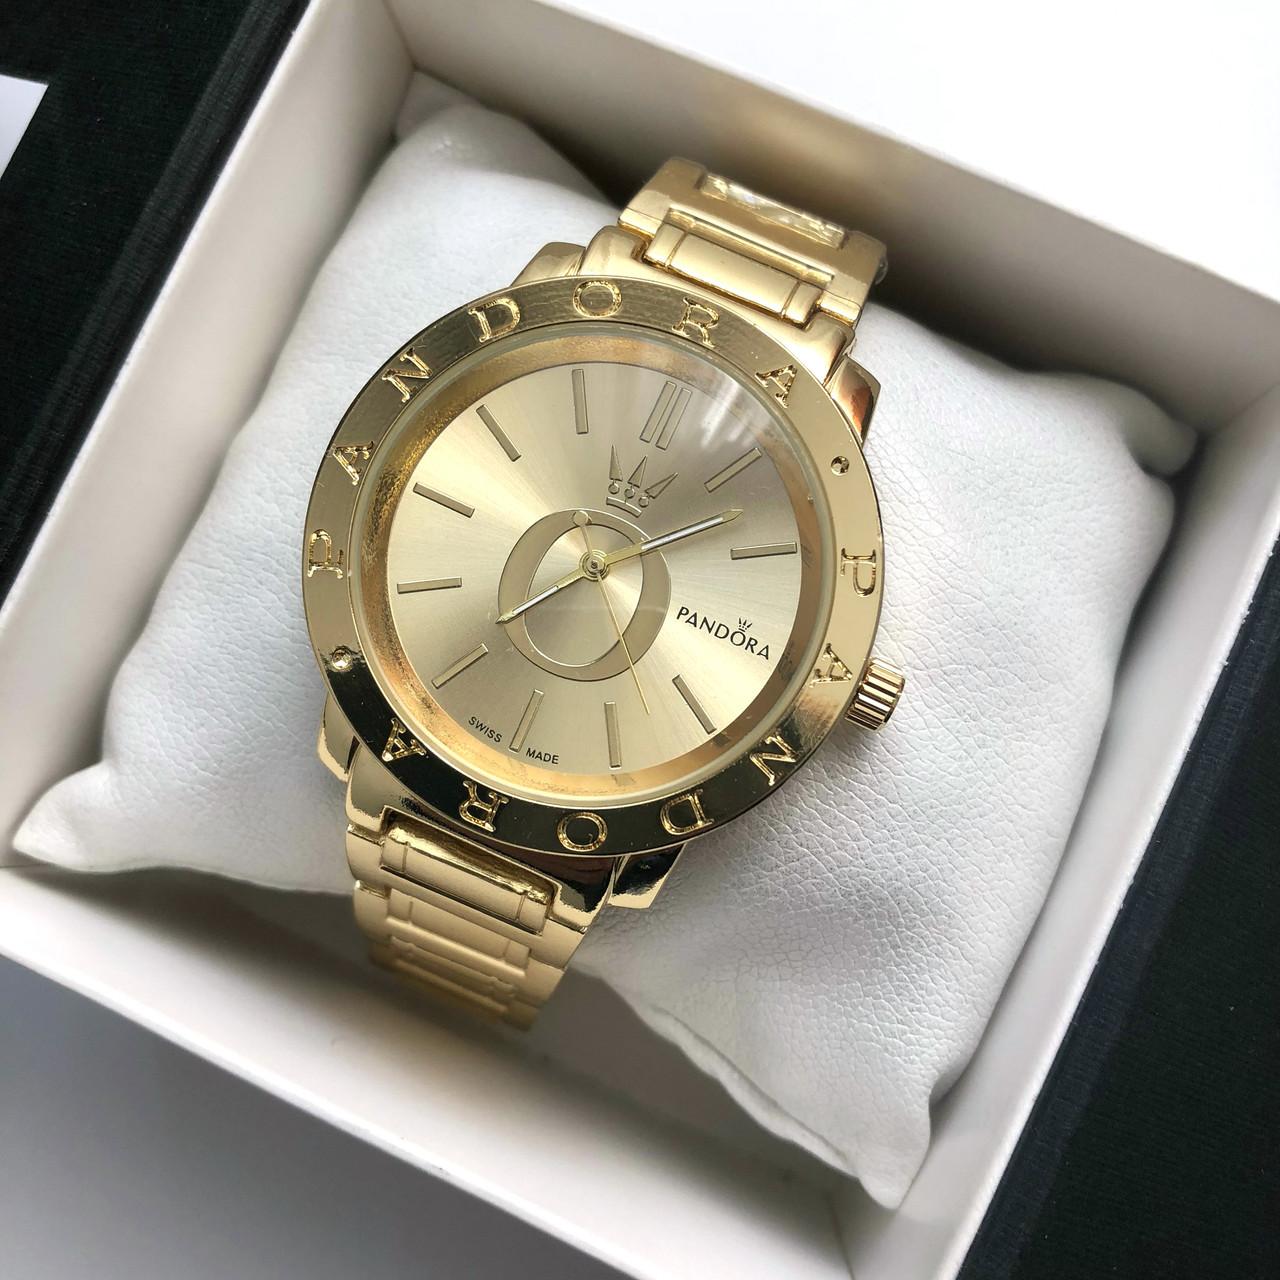 d8b23d33aea9 Часы женские, наручные, золотые